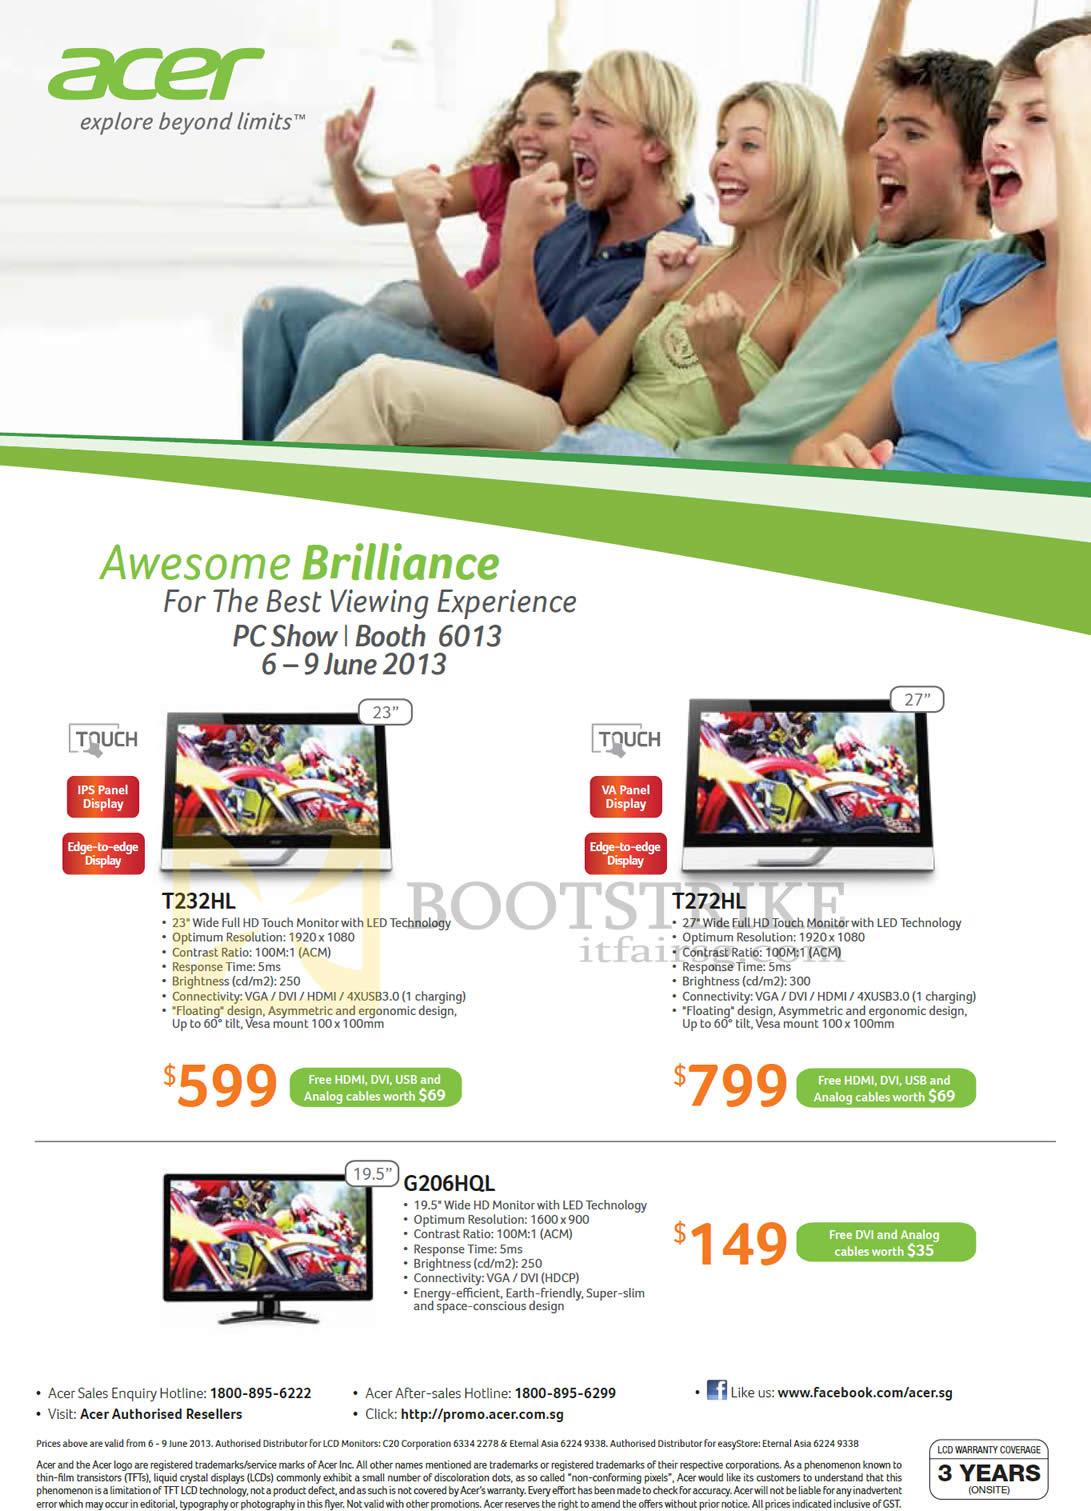 PC SHOW 2013 price list image brochure of Acer Monitors T232HL, T272HL, G206HQL